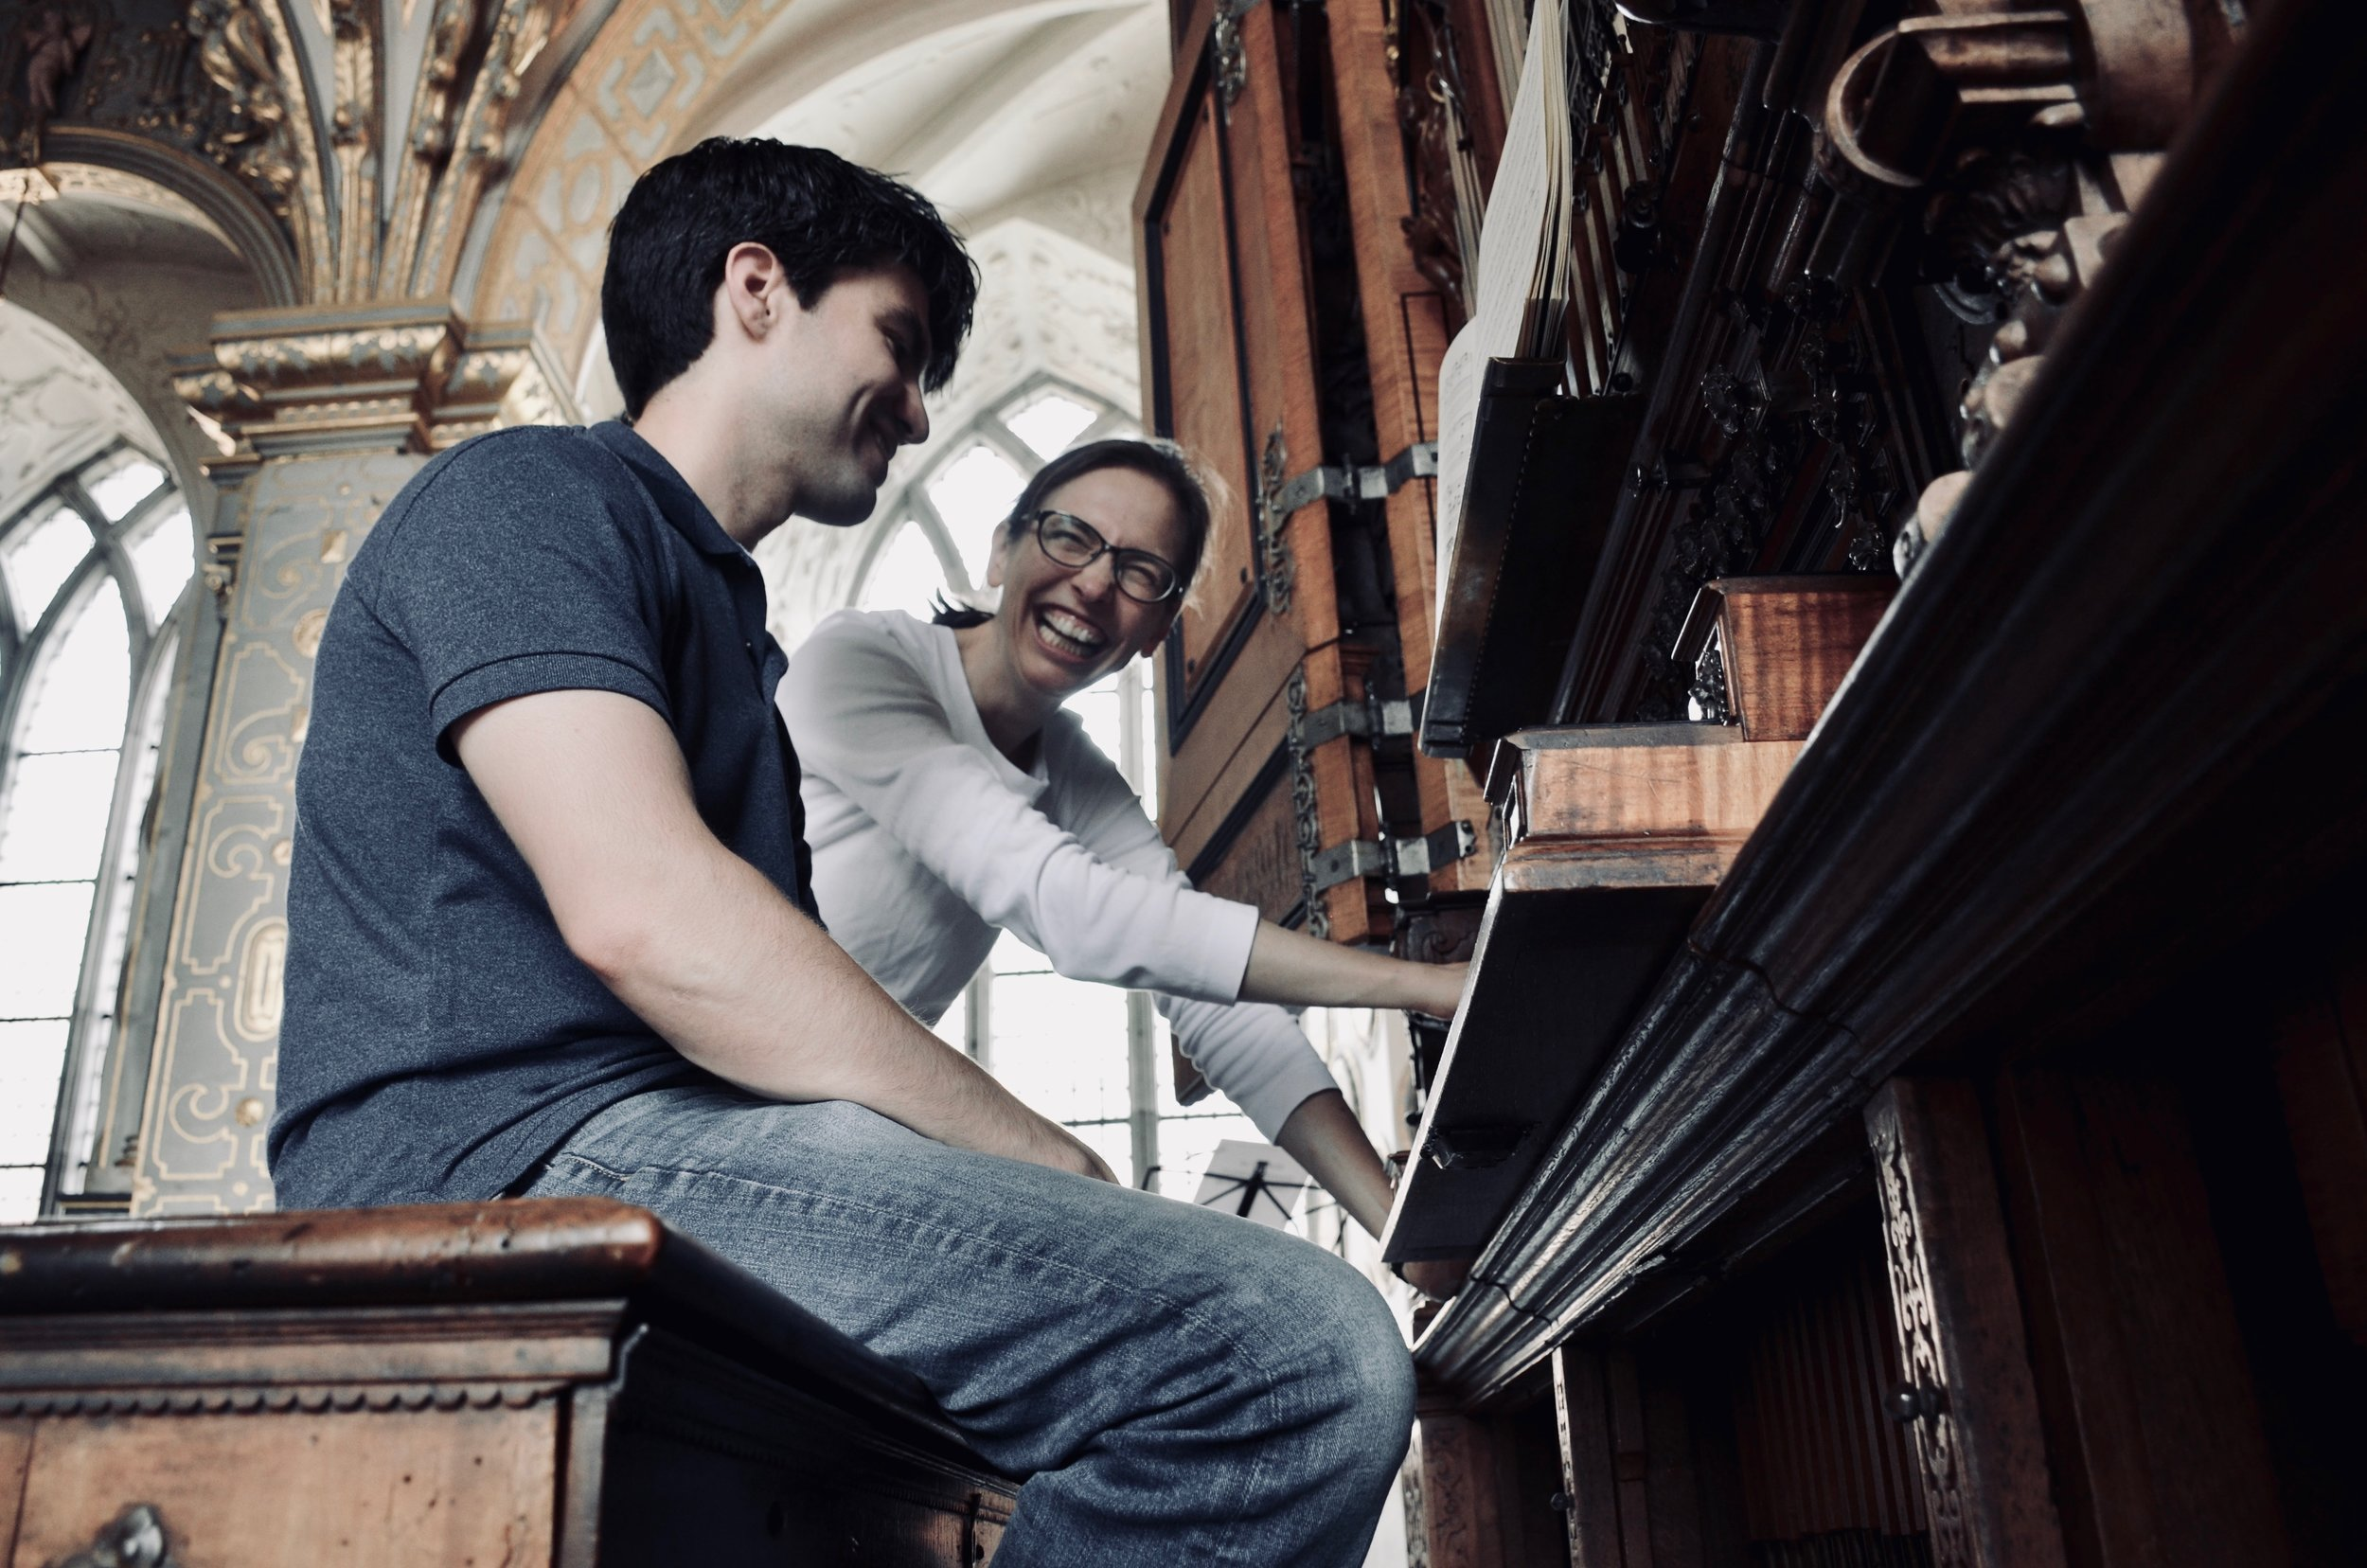 Bine Bryndorf coaches student Brandon Santini on the 1610 Compenius organ of Frederiksborg Castle, Hillerød, Denmark, 2018.